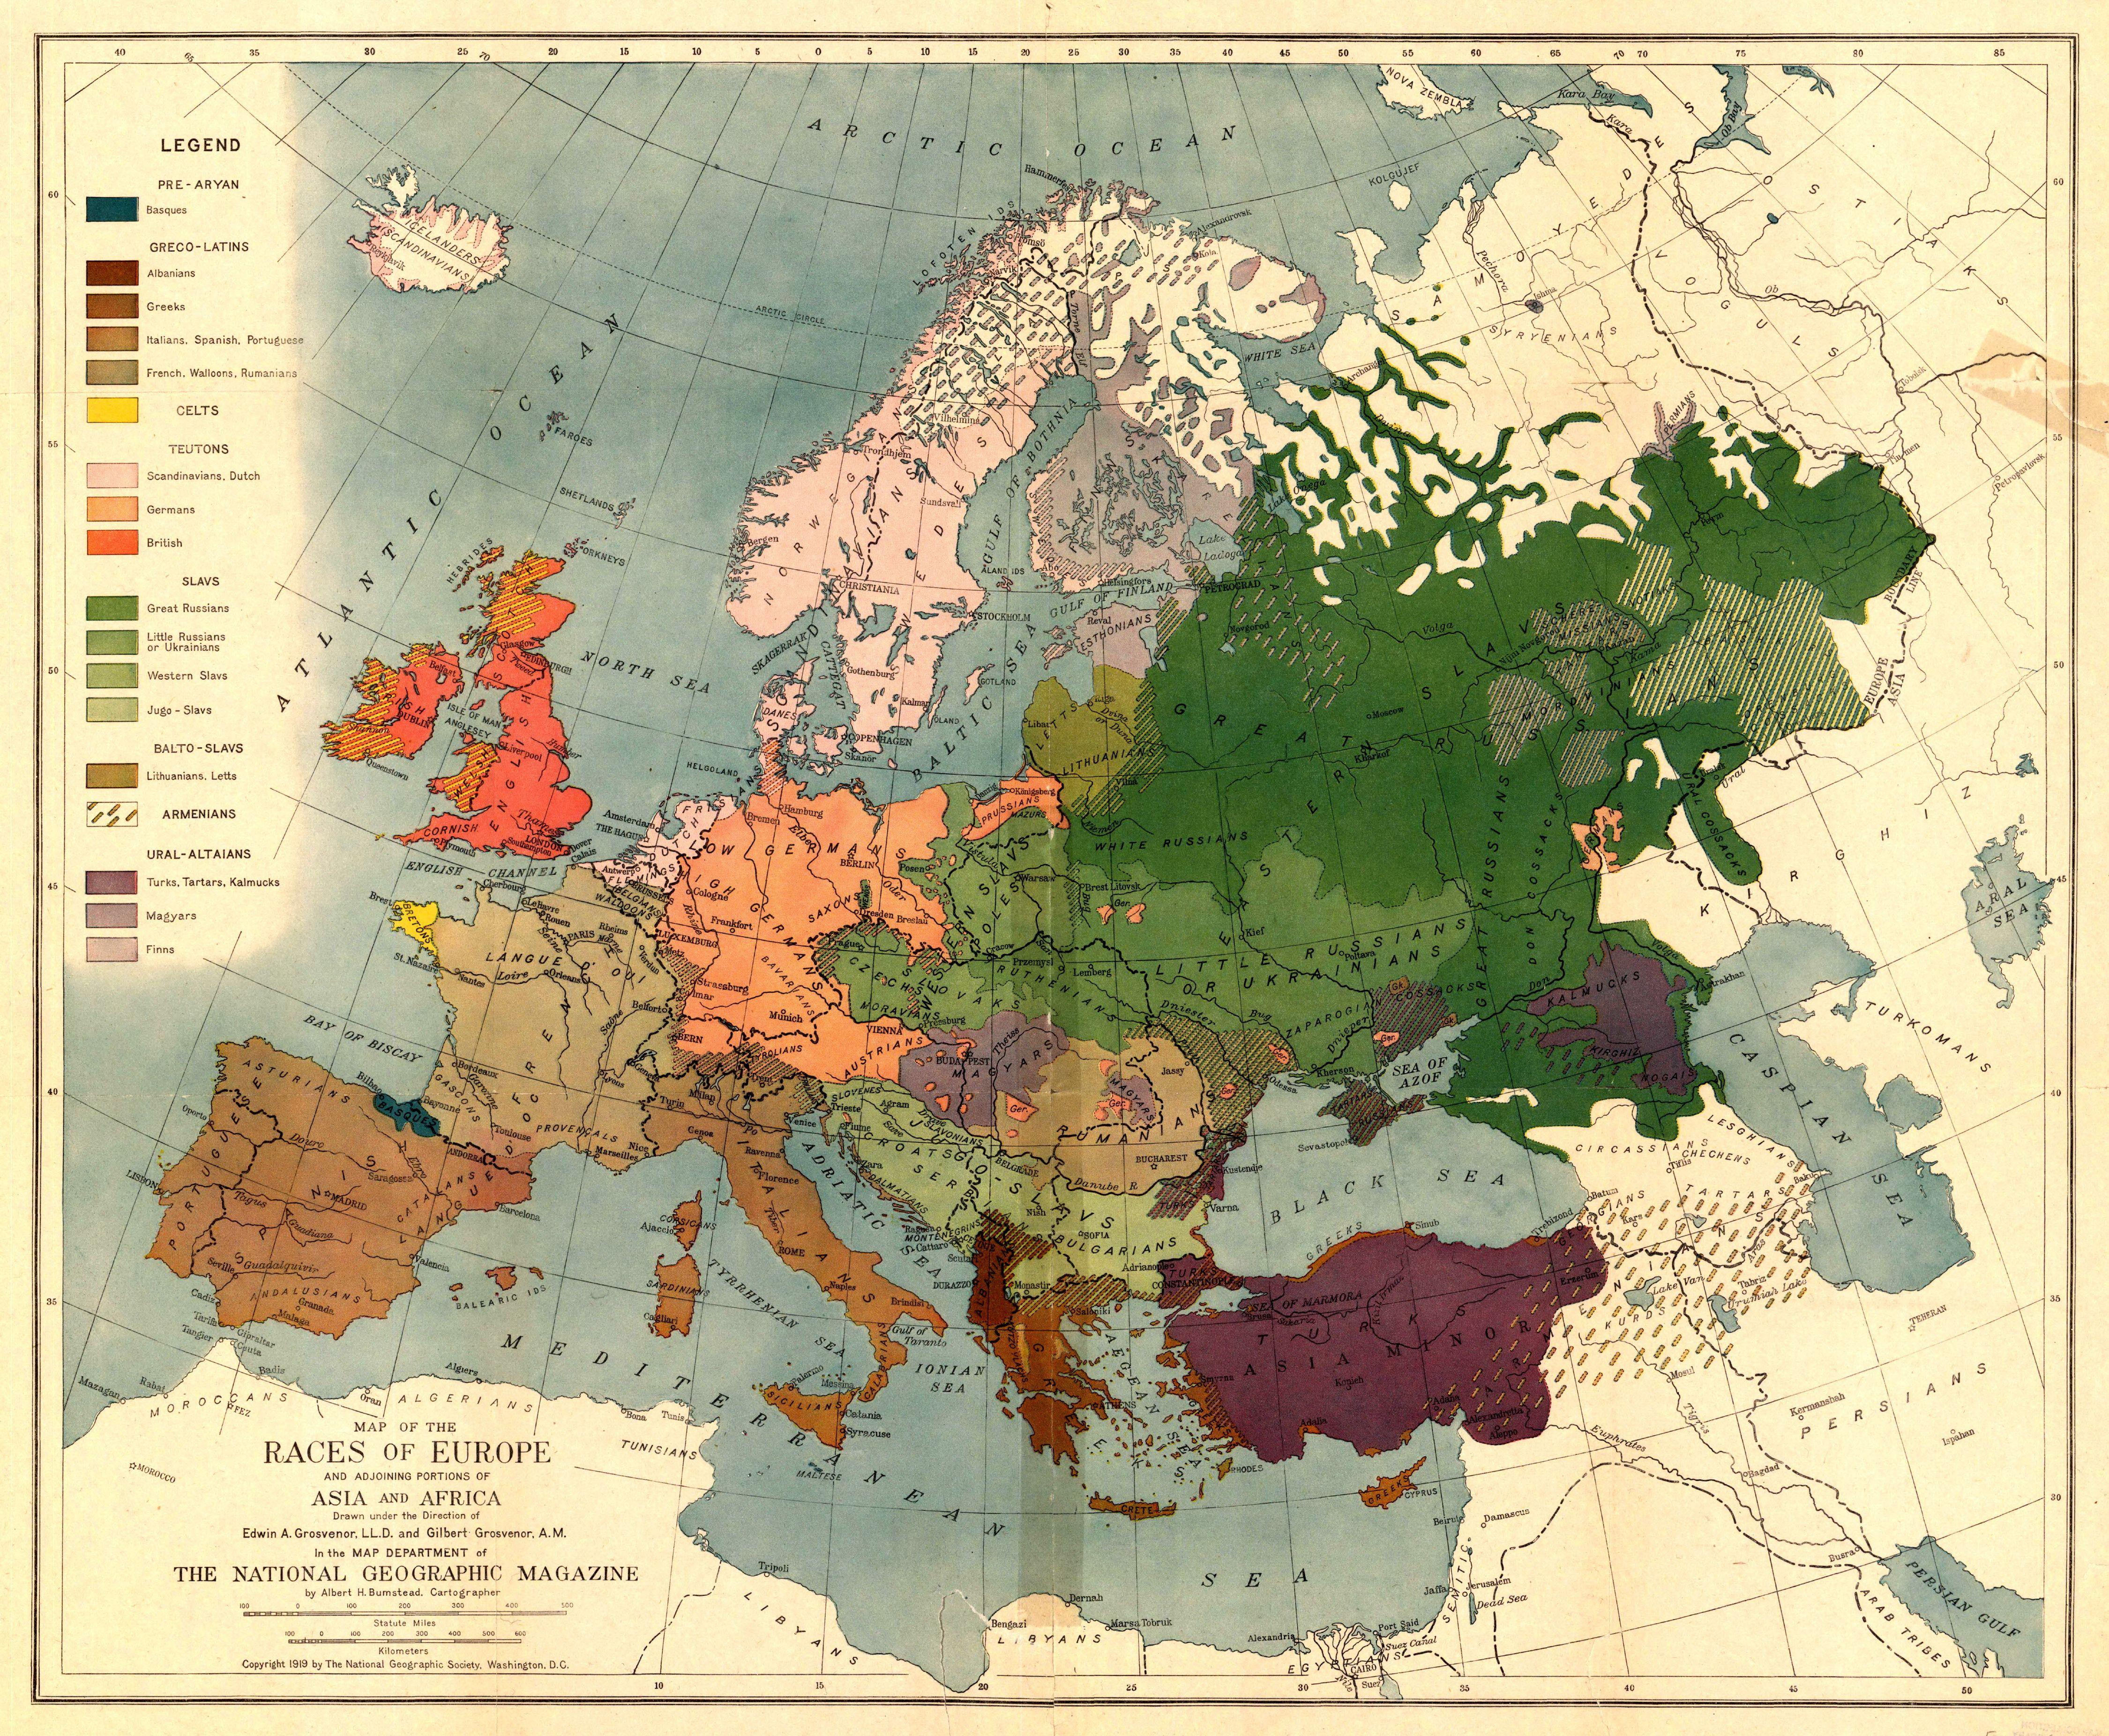 Farsi Map Of Europe Russian Map Of Europe Spanish Map Of Europe - Farsi language map